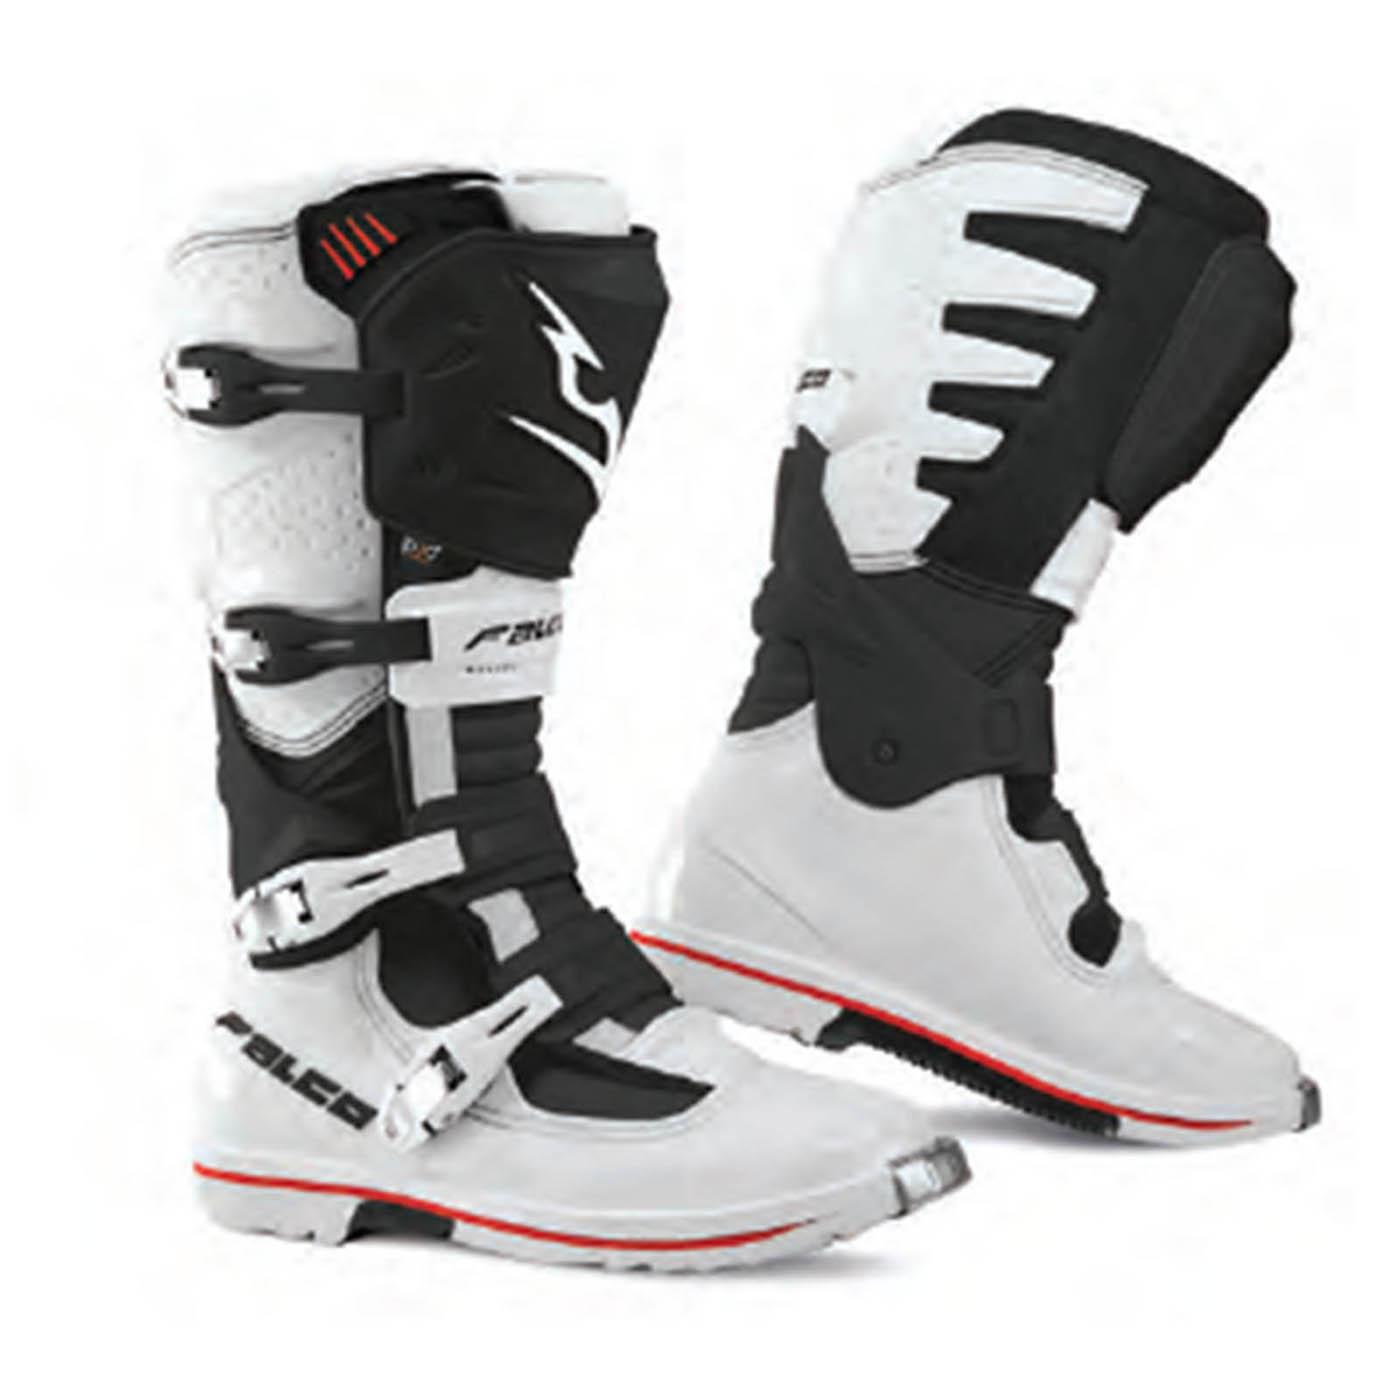 Details about Falco Extreme Pro 3.1 Boots Black White 10 44 Men Off Road Enduro MX Motorcross